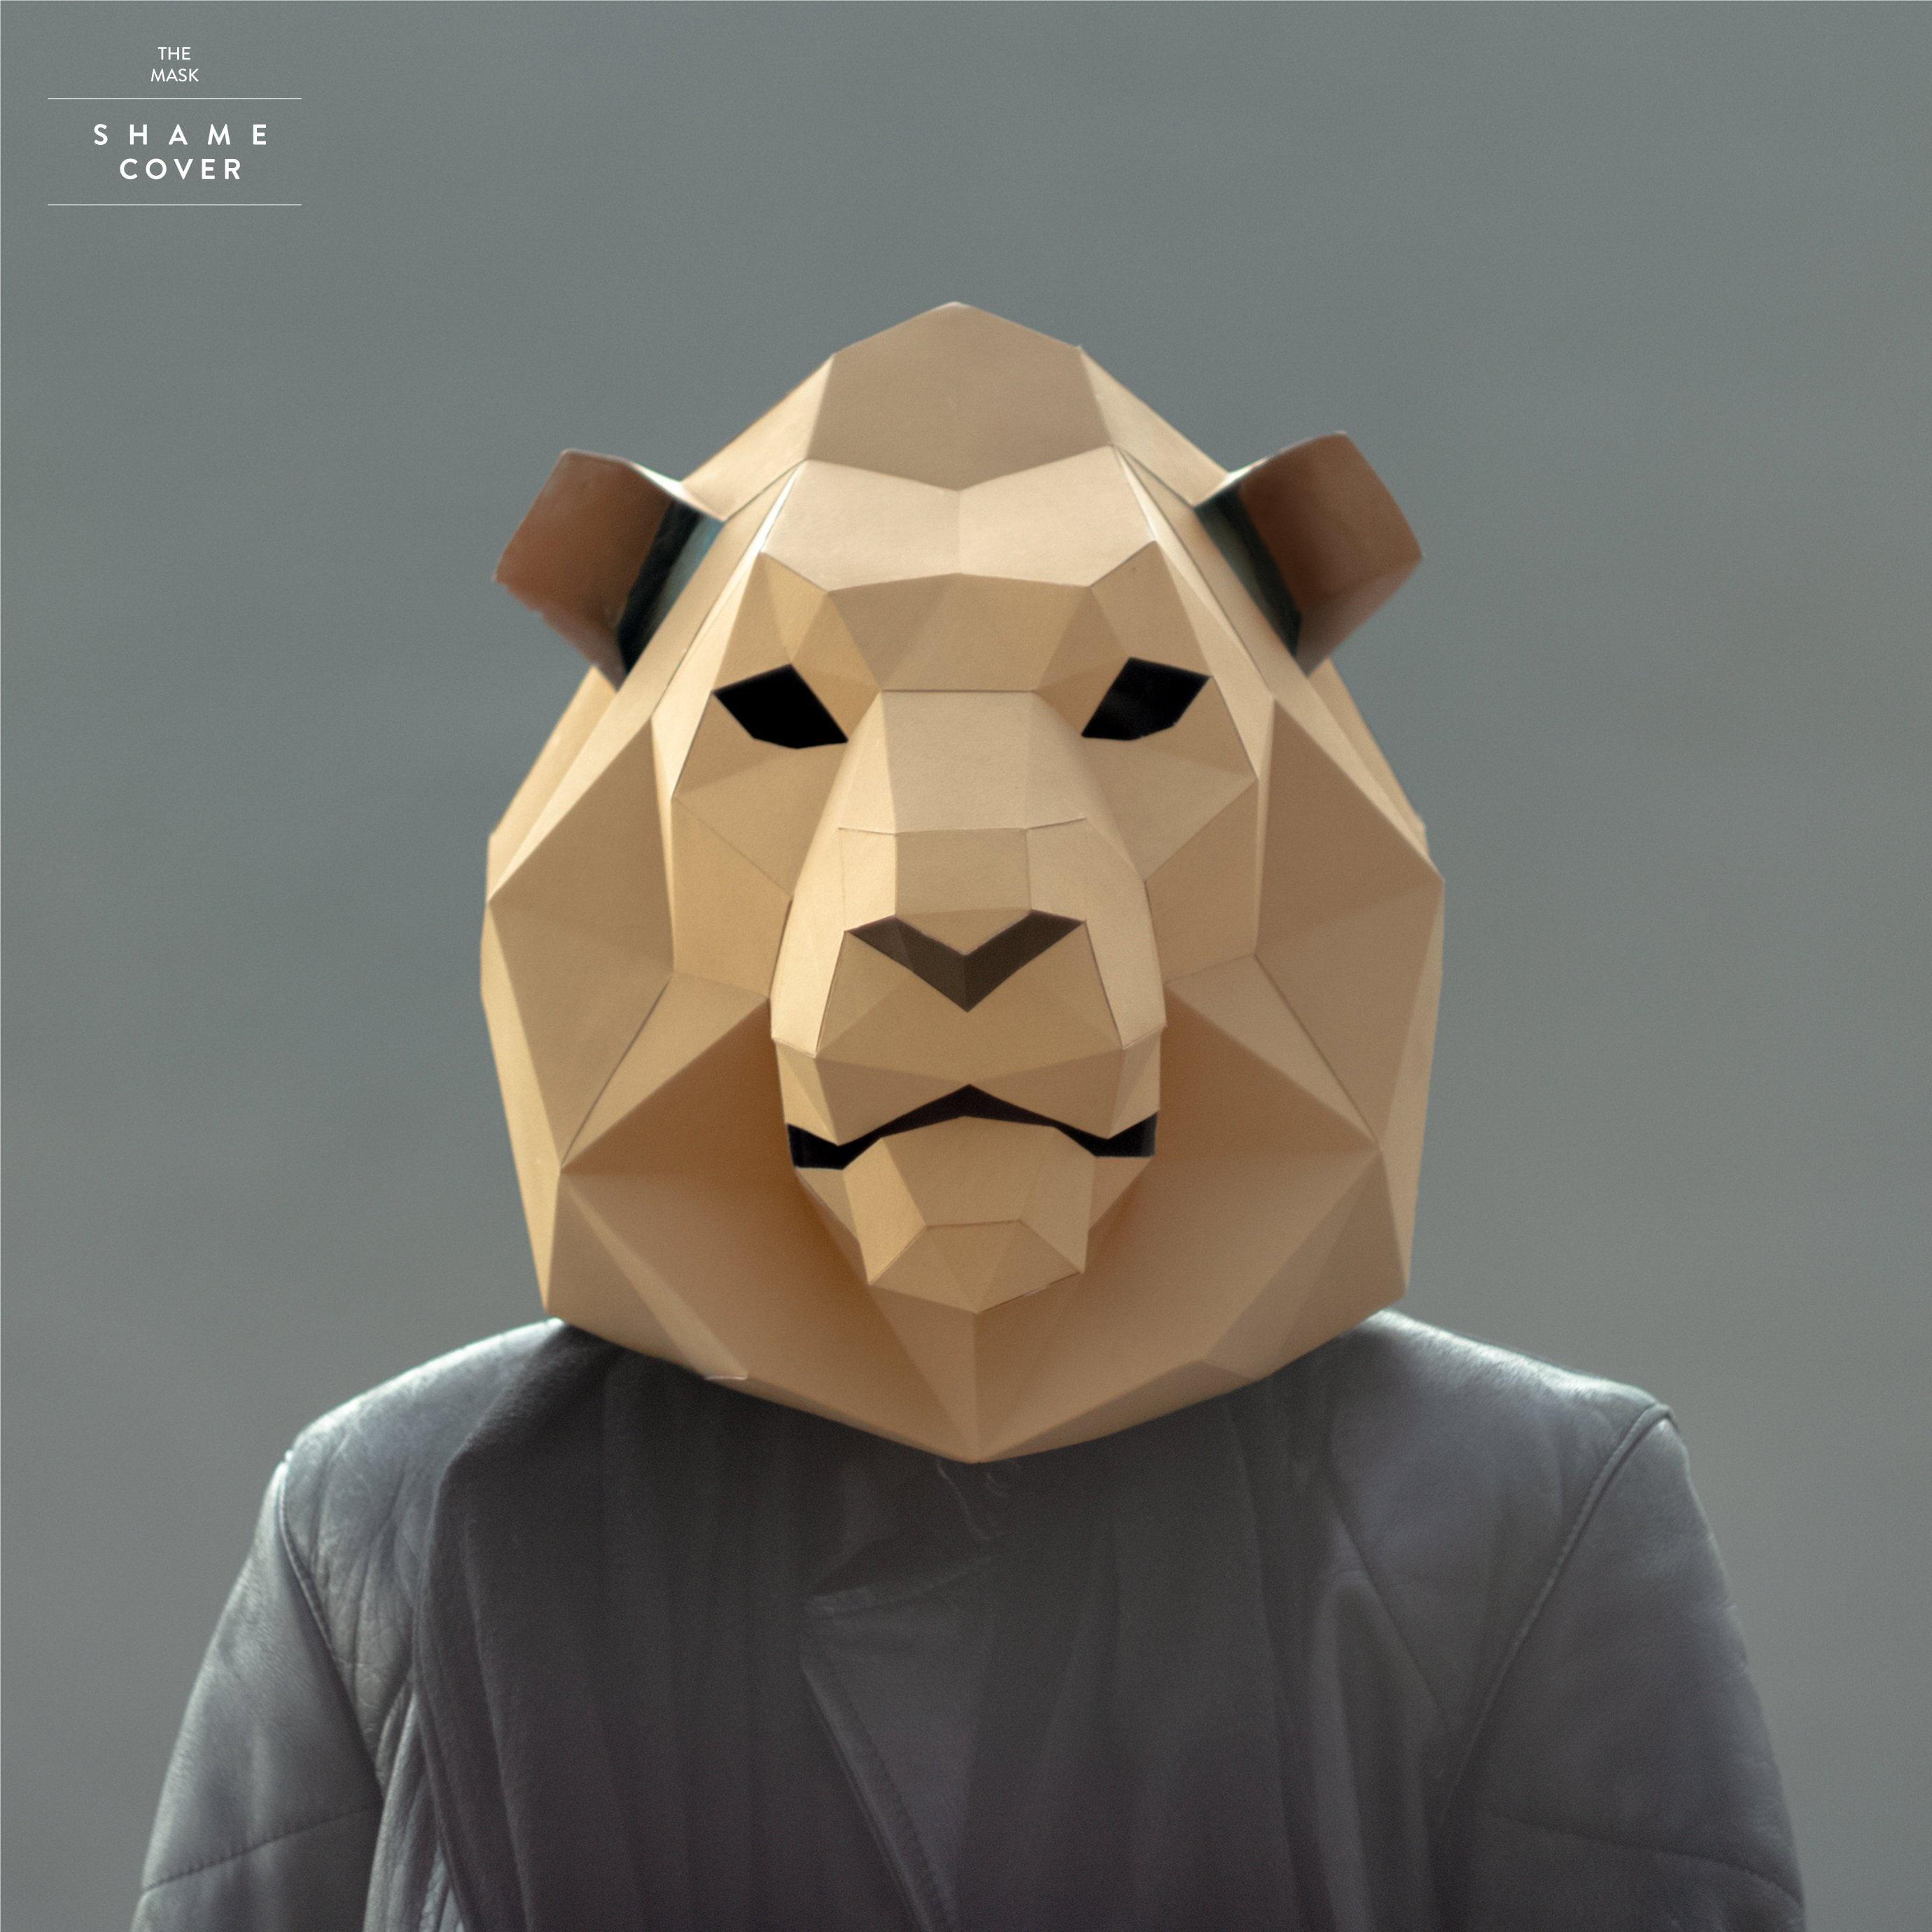 Lion Mask,Cat Mask,DIY 3D mask,PDF,Polygon Paper  Mask,Template,Printable,Animal,Pattern mask,Low Poly,Papercraft  Mask,Costume,Halloween